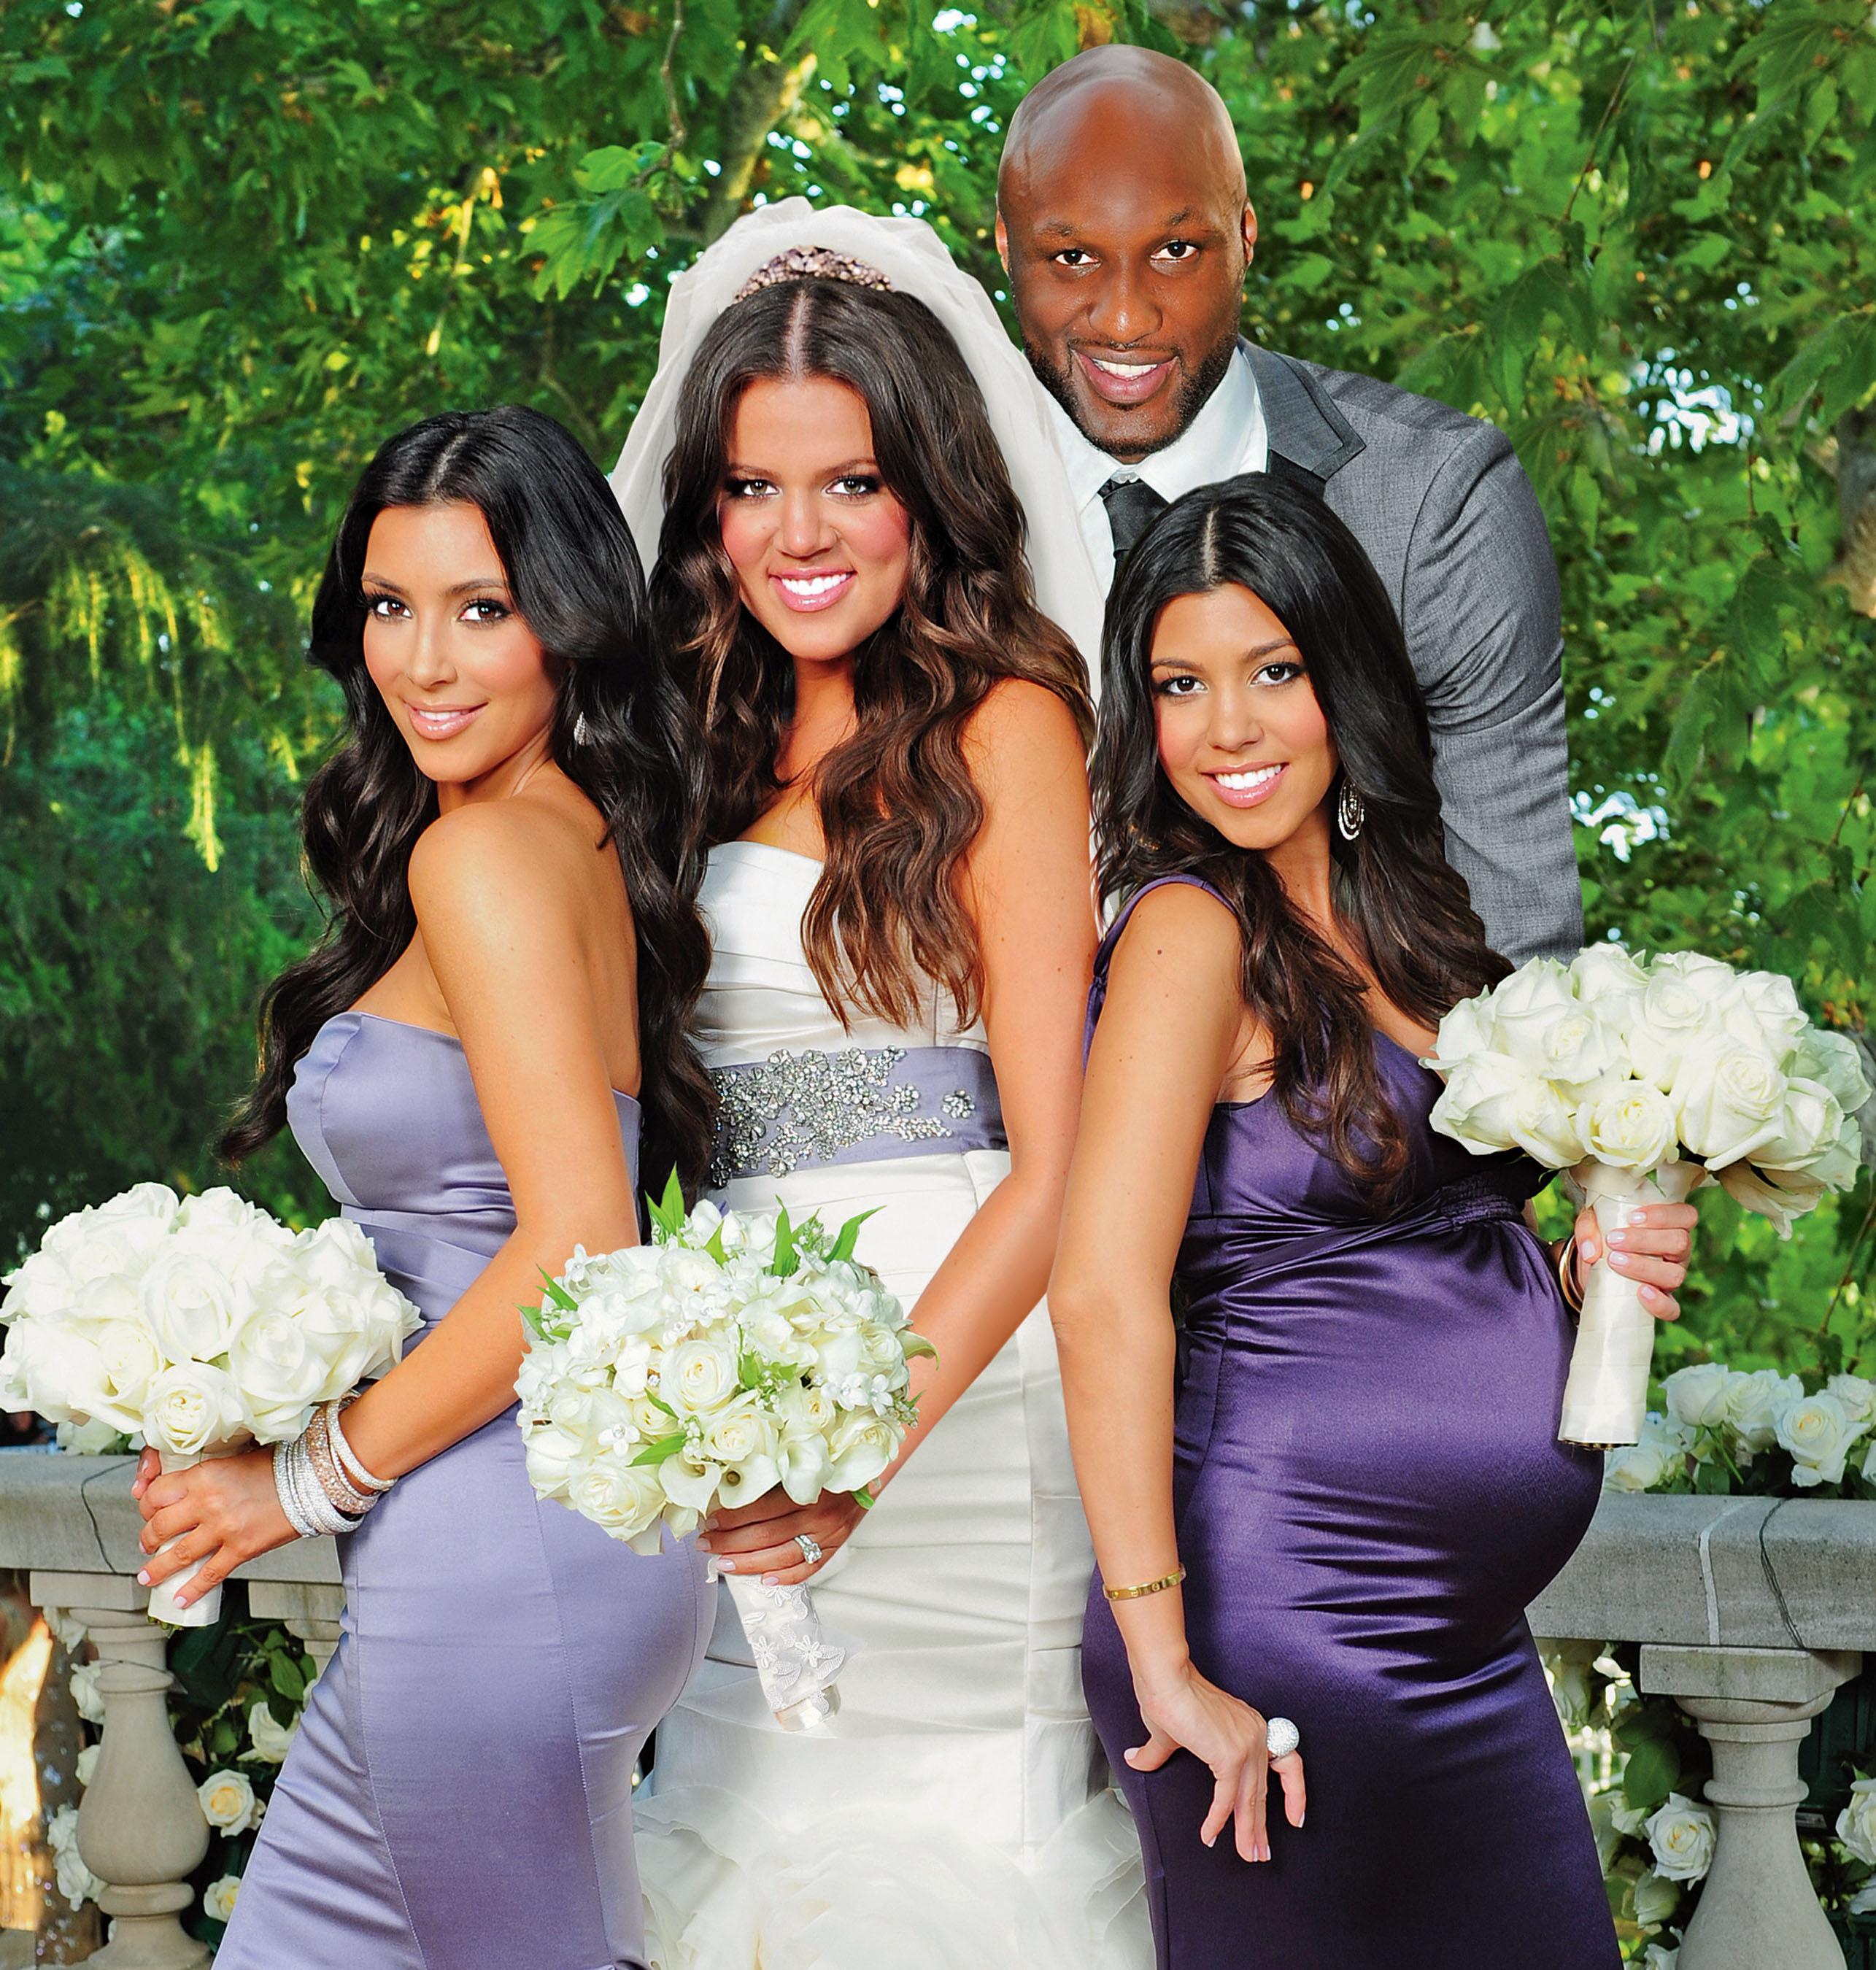 Khloé Kardashian Y Lamar Odom Por Fin Se Divorciaron